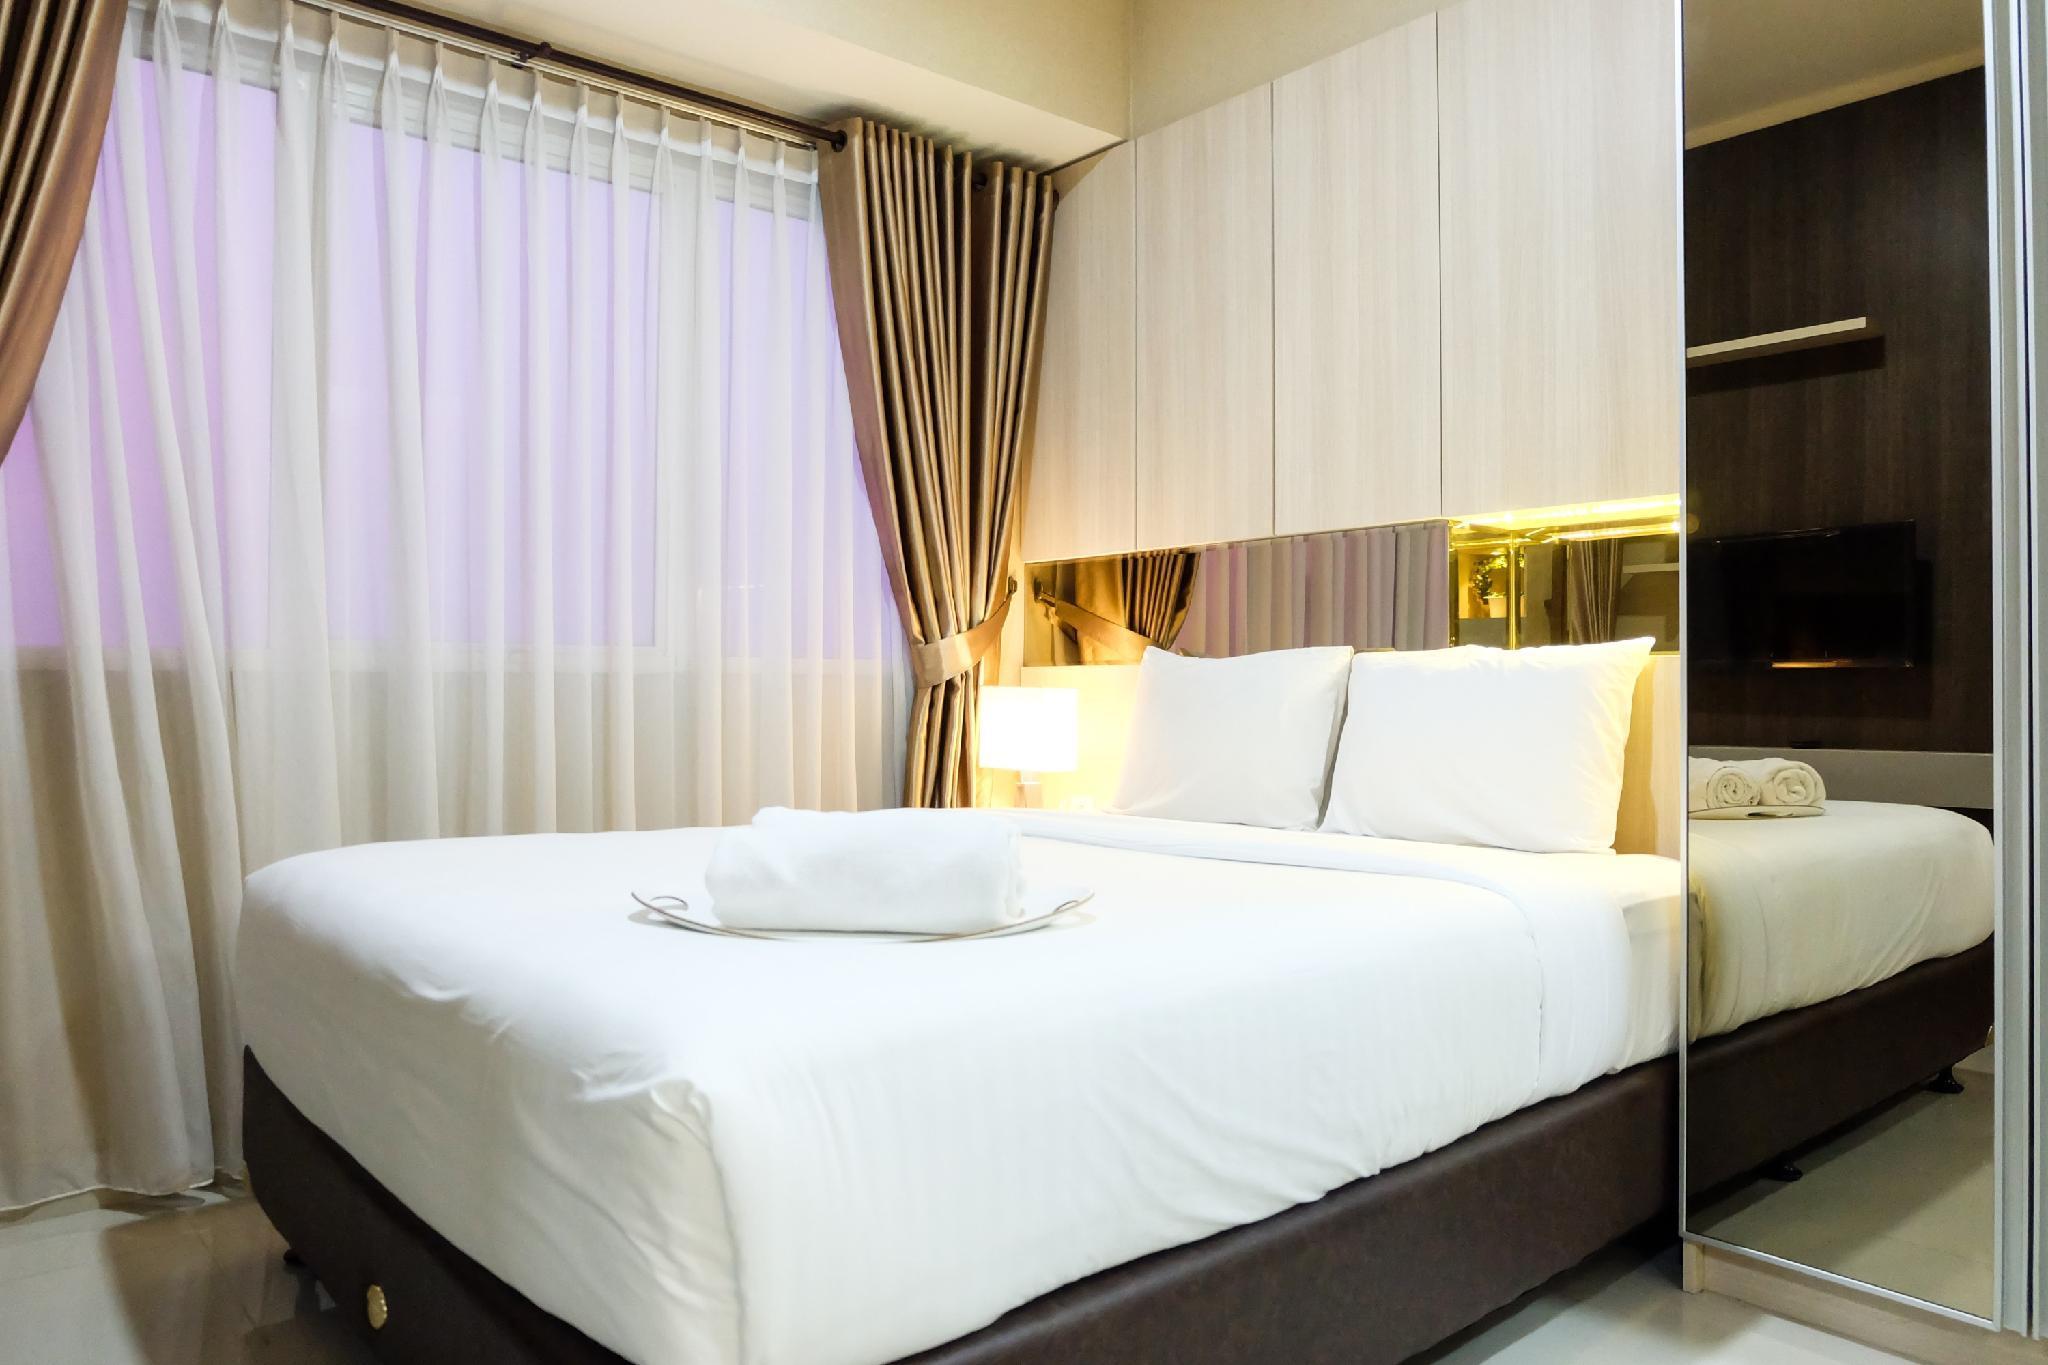 Modern 1BR Oasis Cikarang Apartment By Travelio